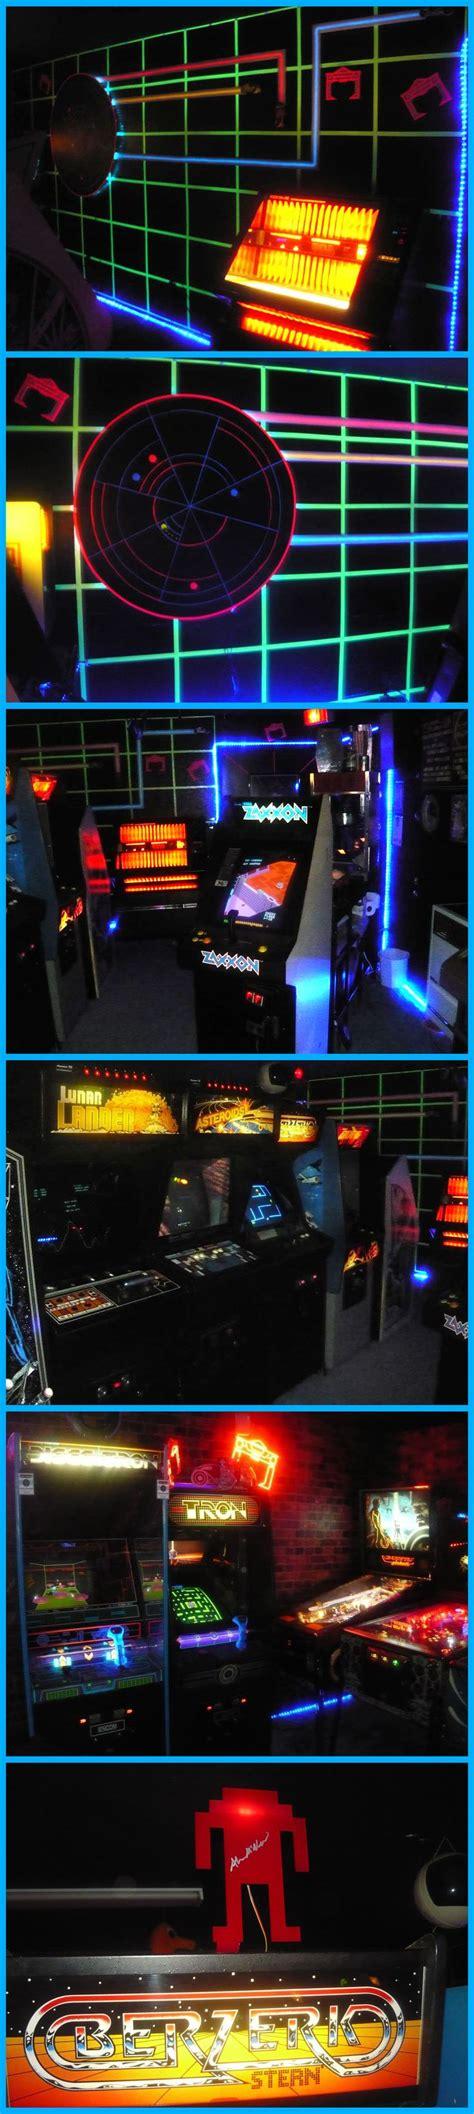 casinos with table games near me arcade room near me home decor exteriorslovable modern